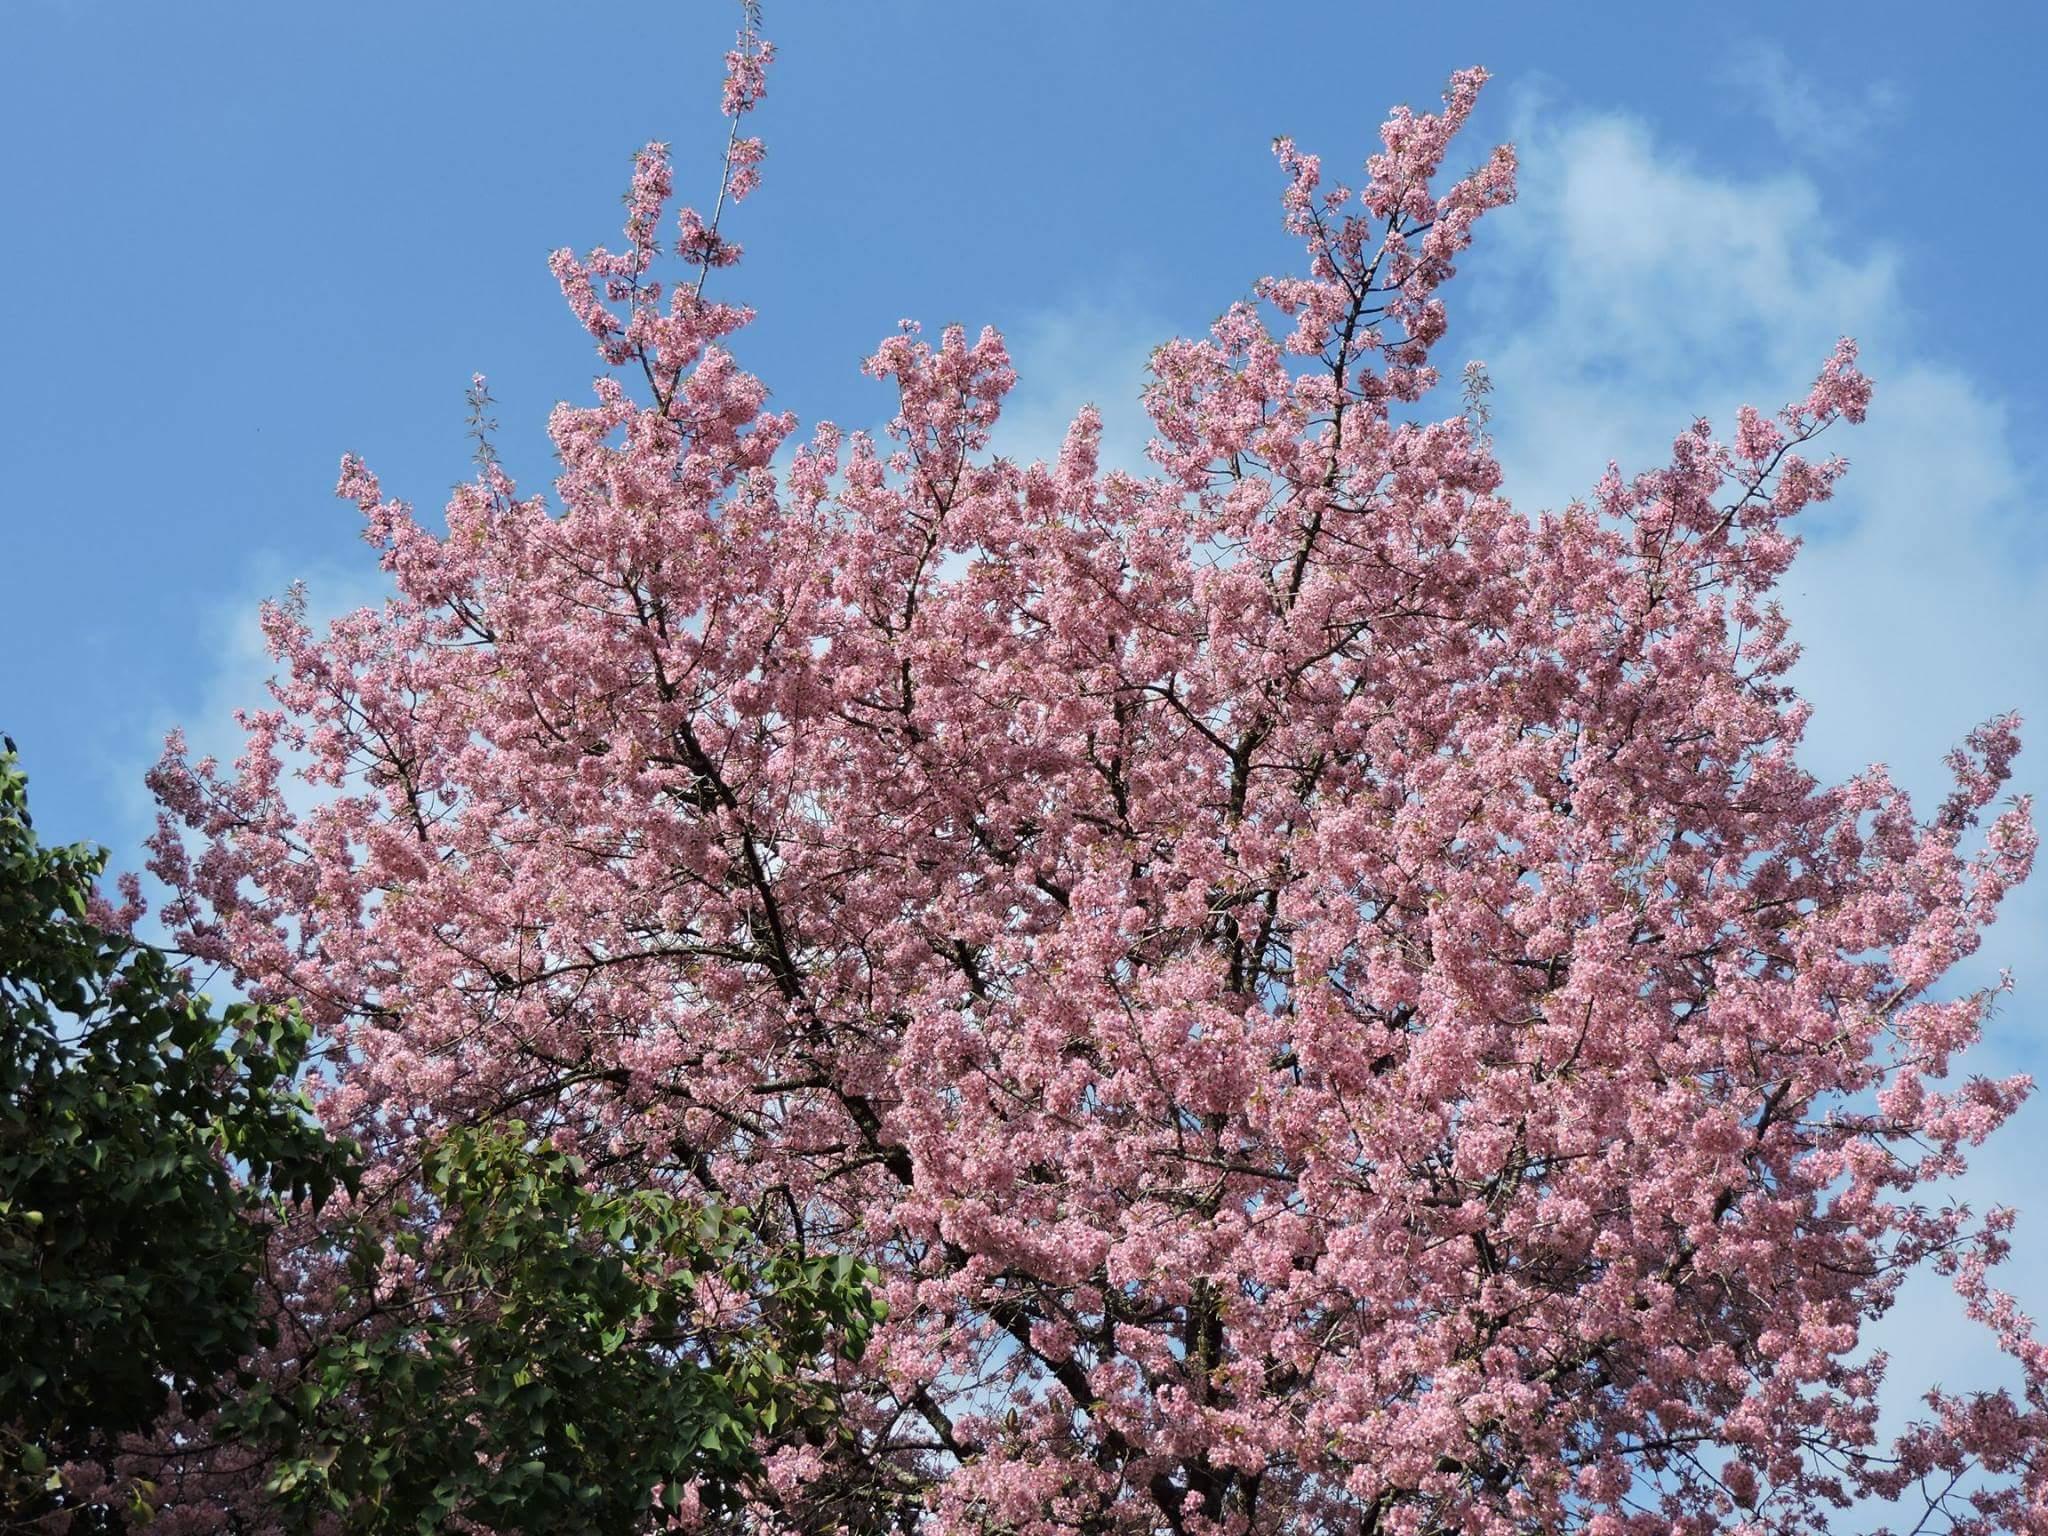 Shillong is hosting world's only Autumn Cherry Blossom Festival